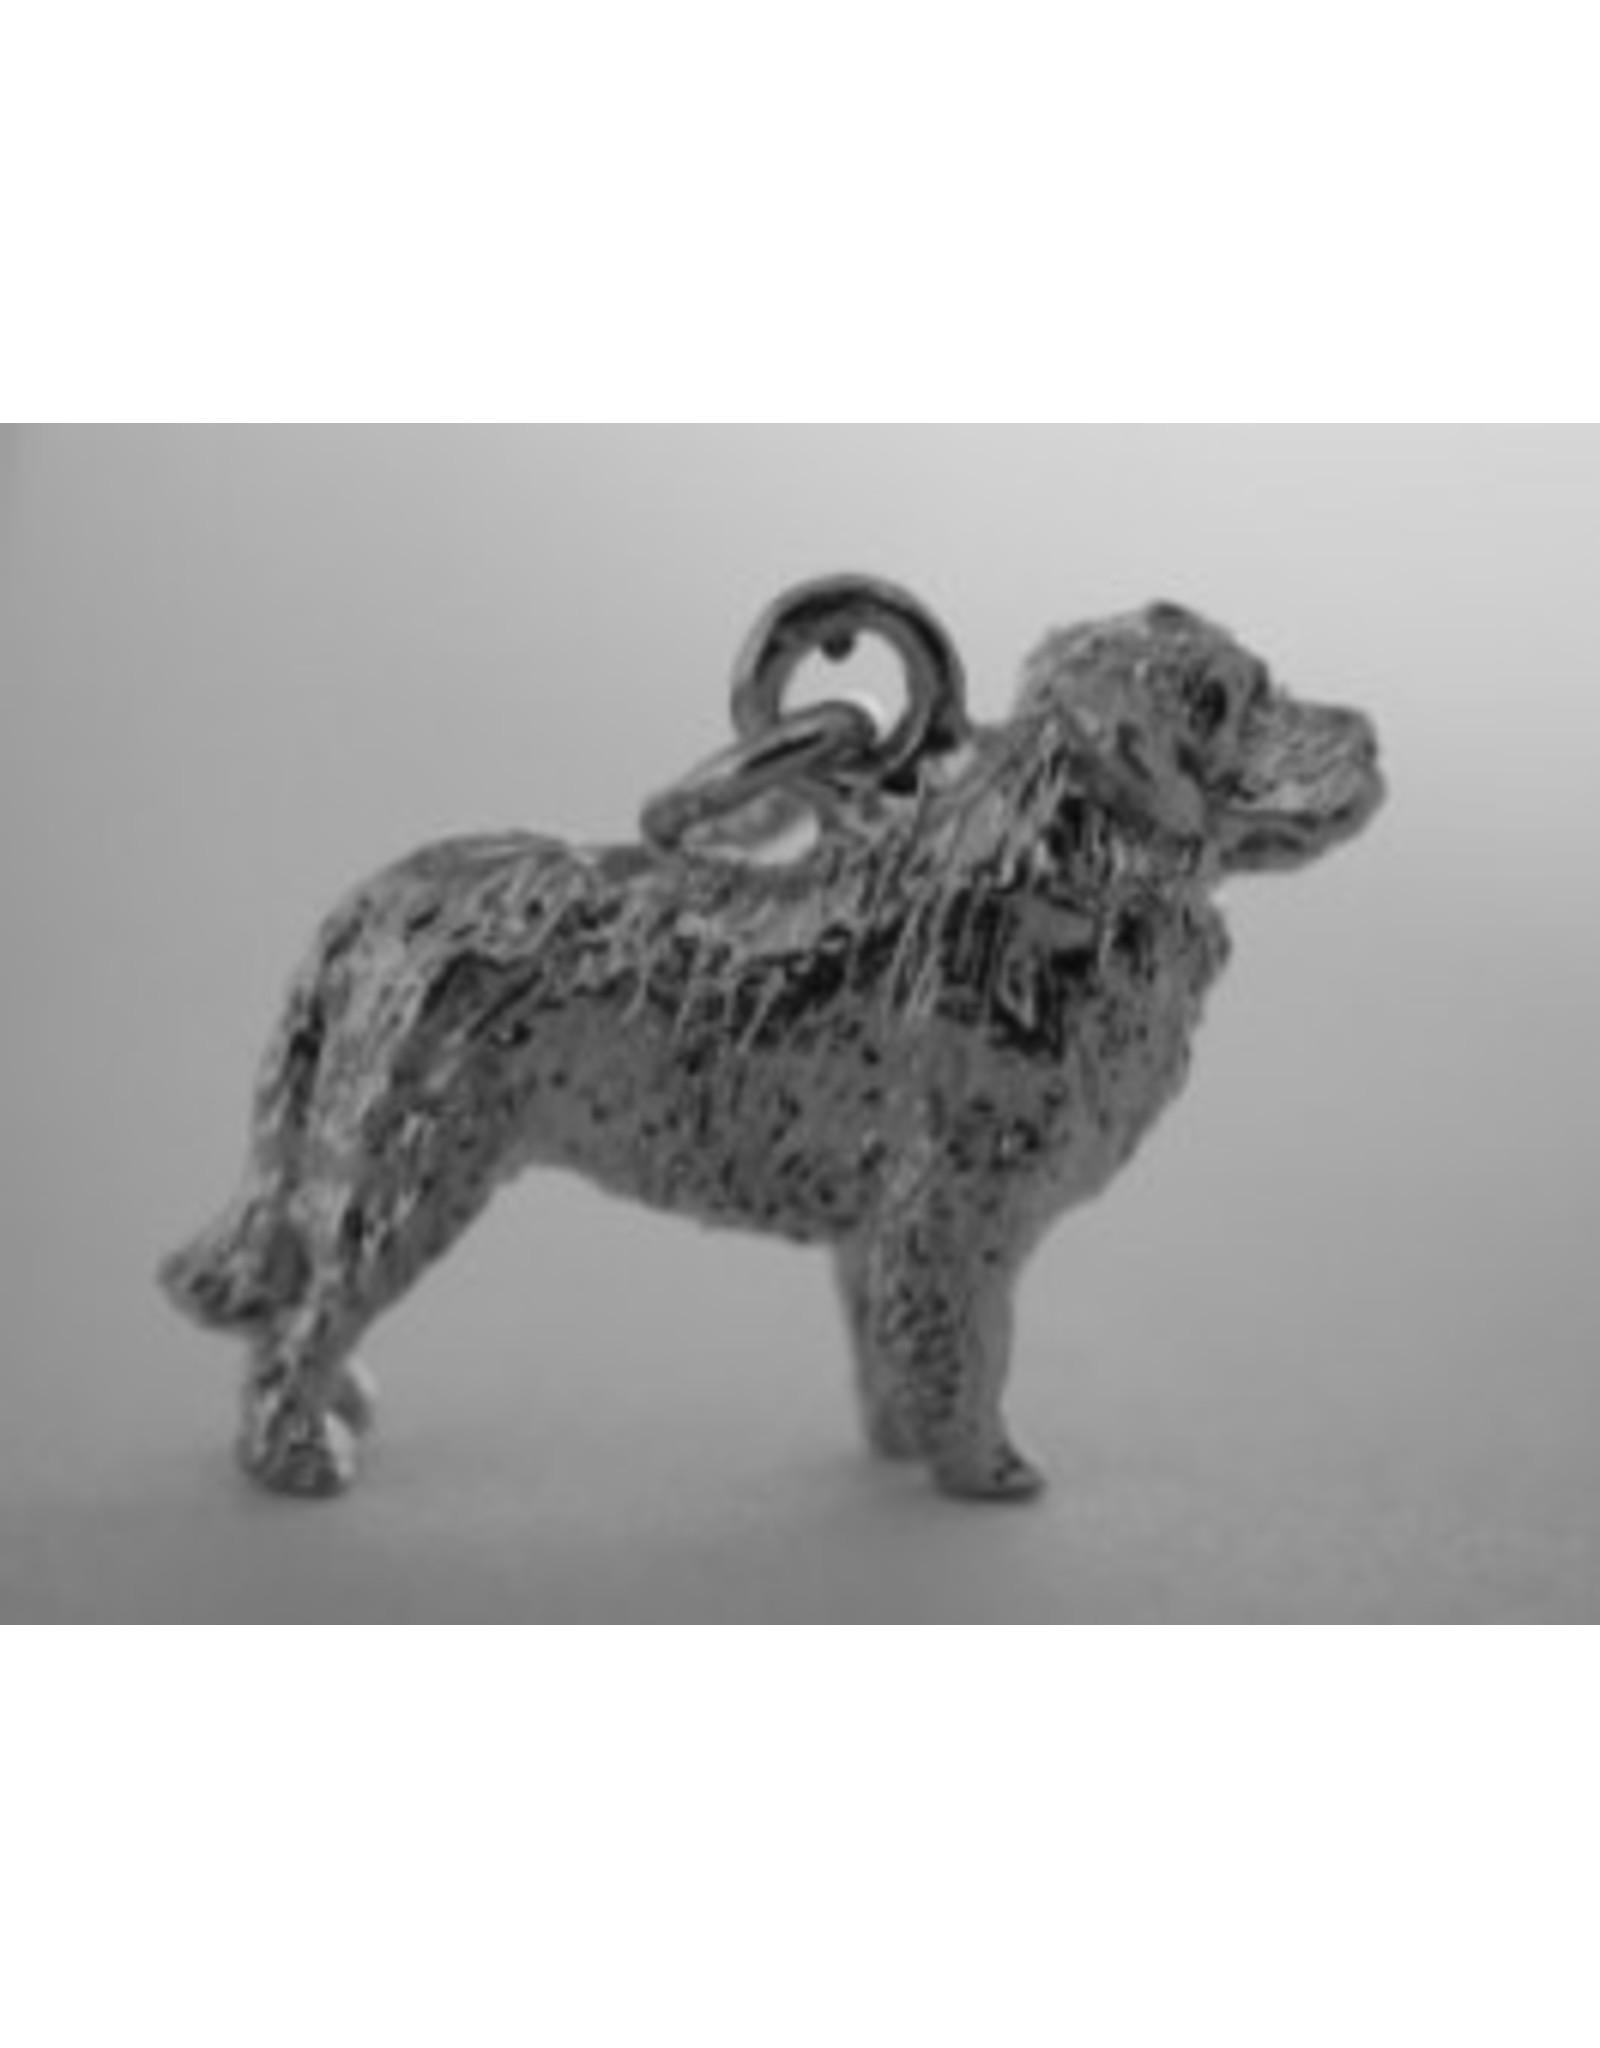 Handmade by Hanneke Weigel Zilveren Berner sennenhond